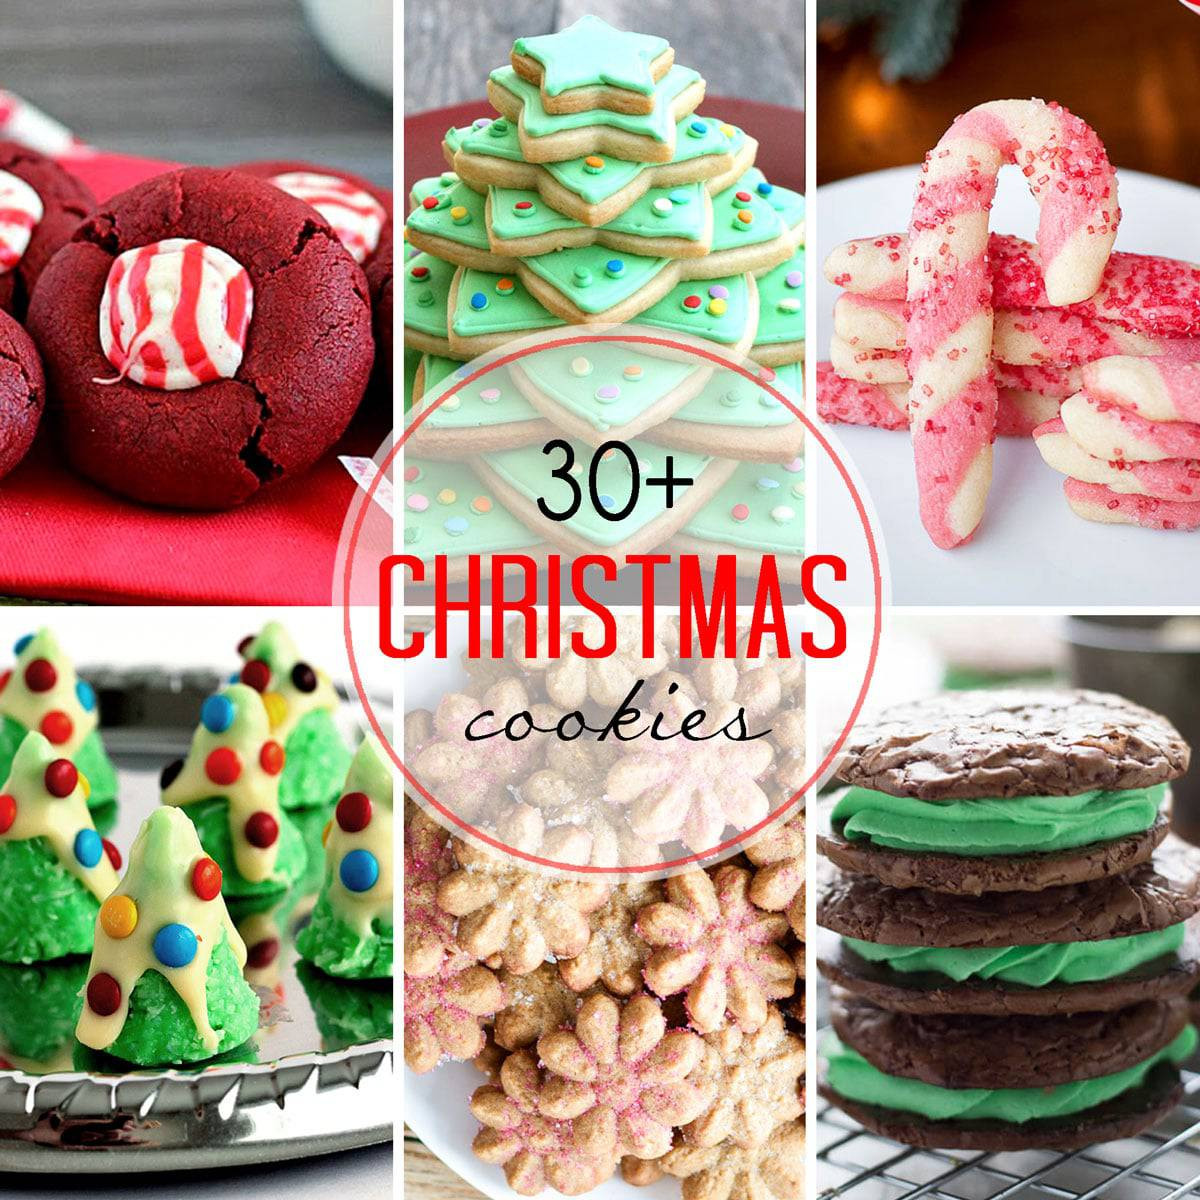 Recipe For Christmas Cookies  30 Plus Festive Christmas Cookie Recipes — Let s Dish Recipes